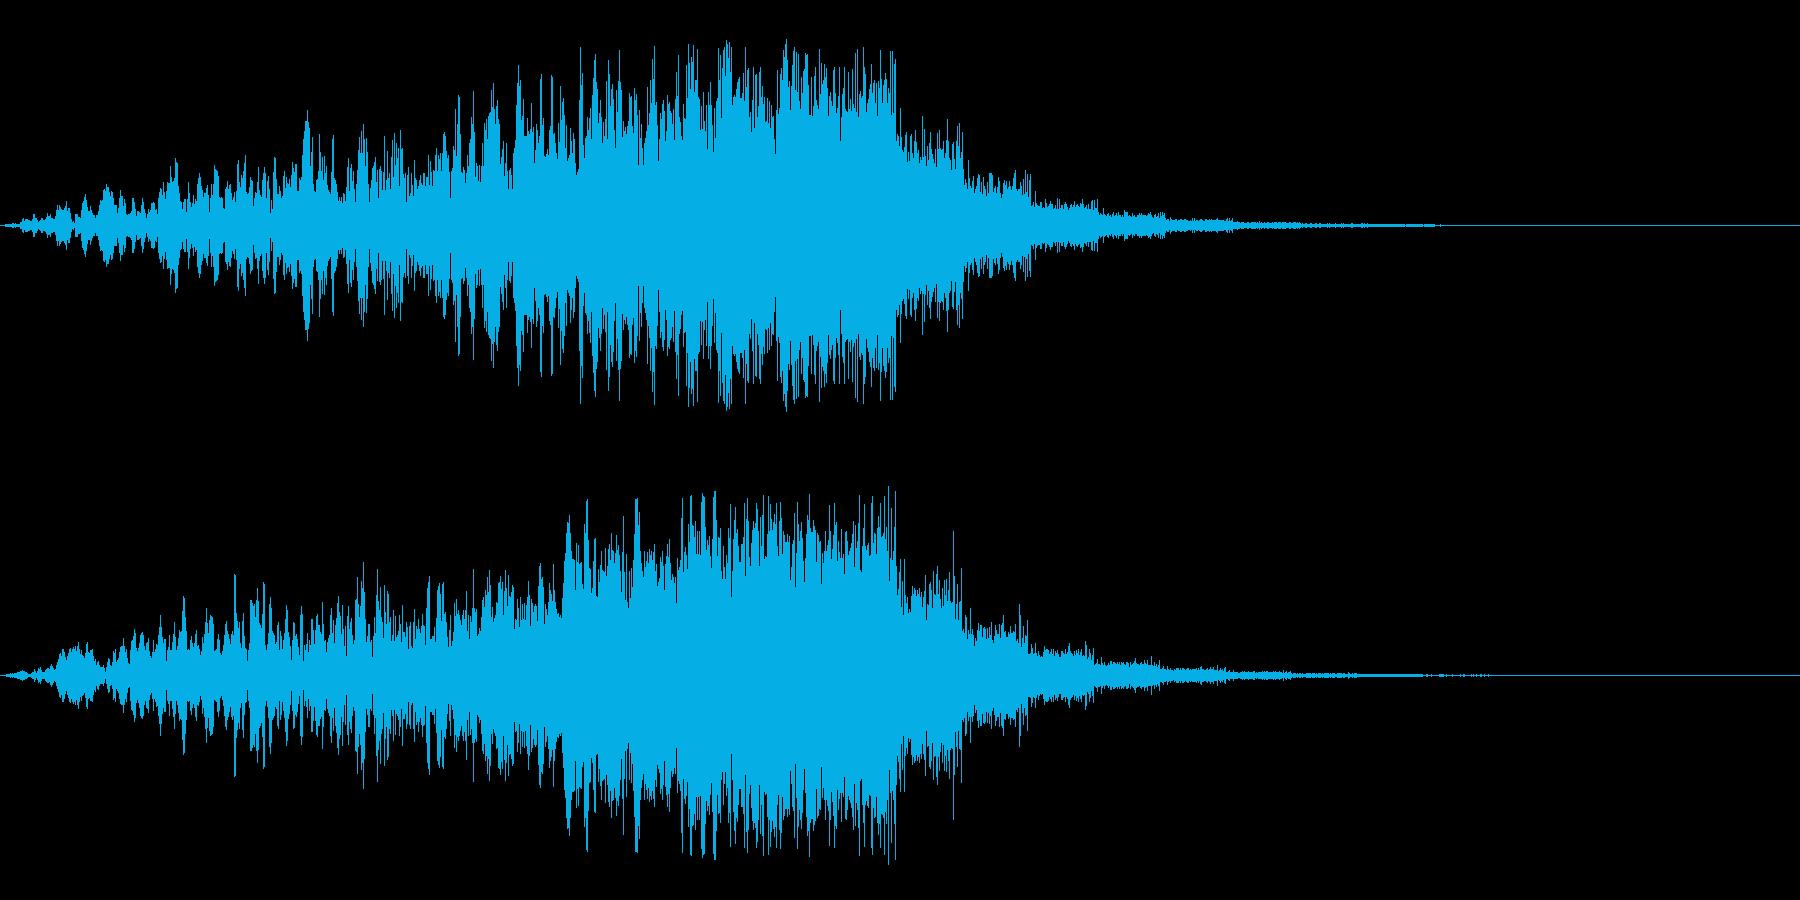 Dark_SweepUp-11Delayの再生済みの波形